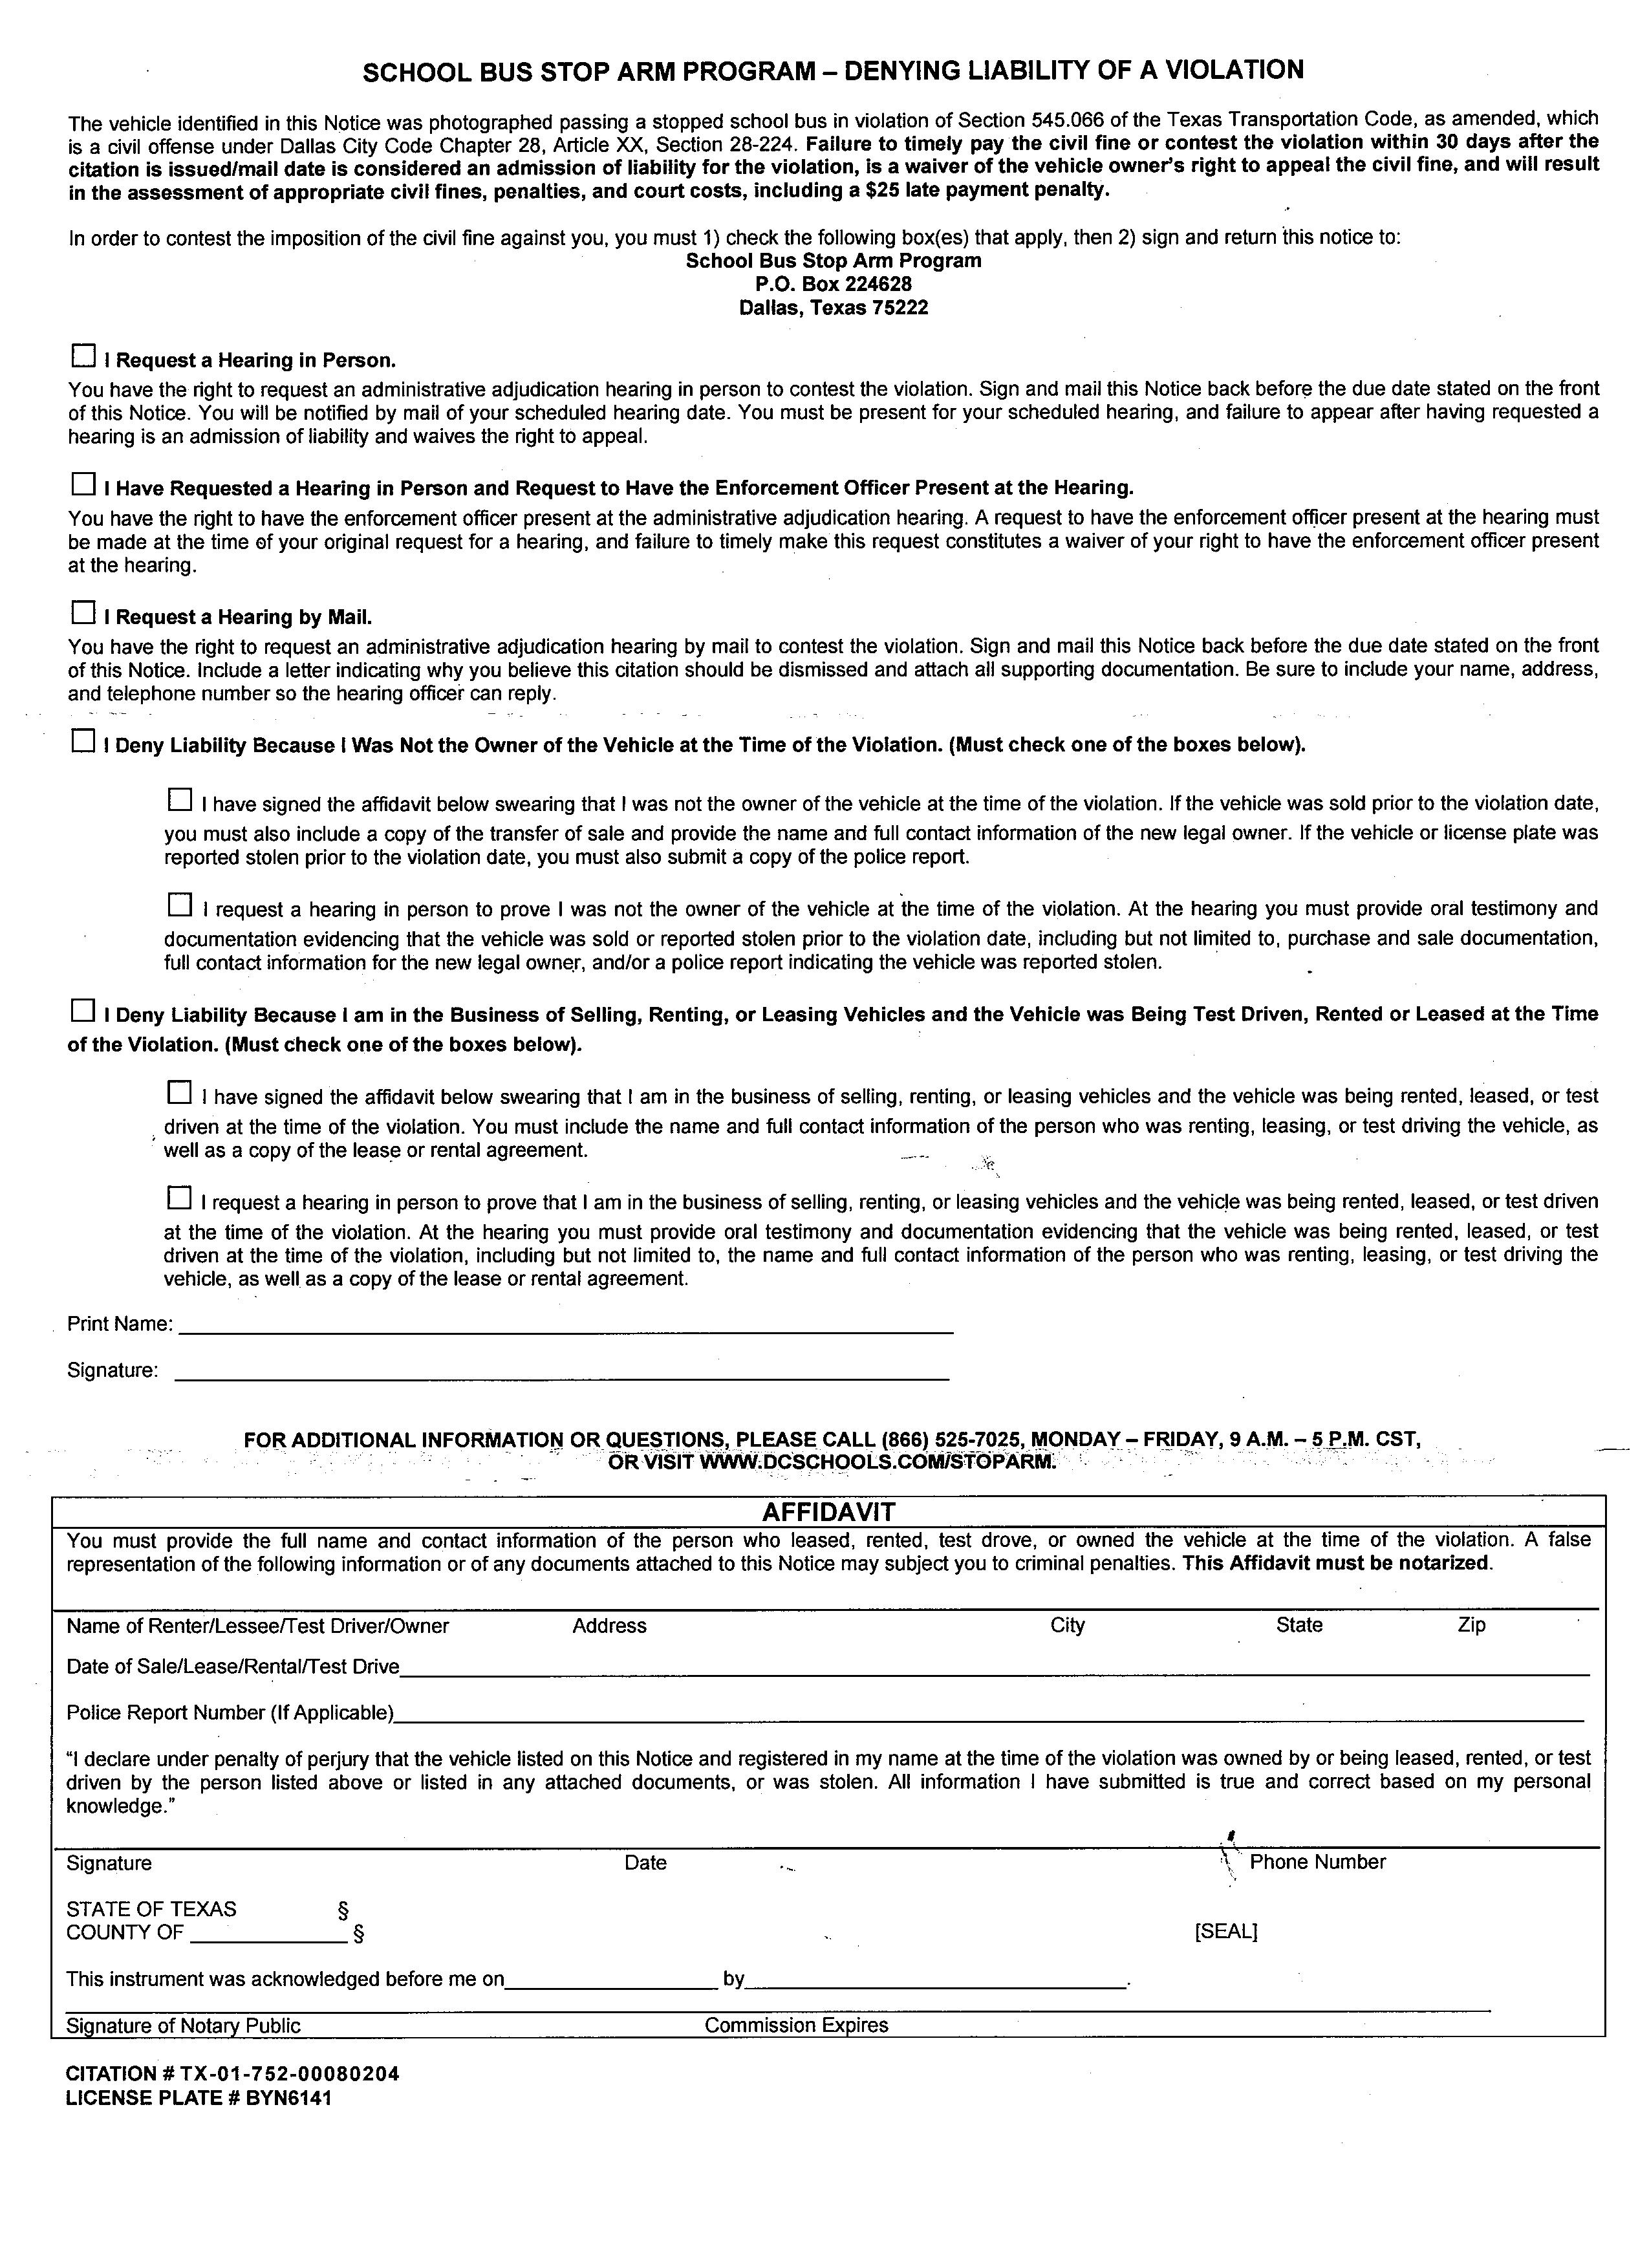 Contesting Violation Form